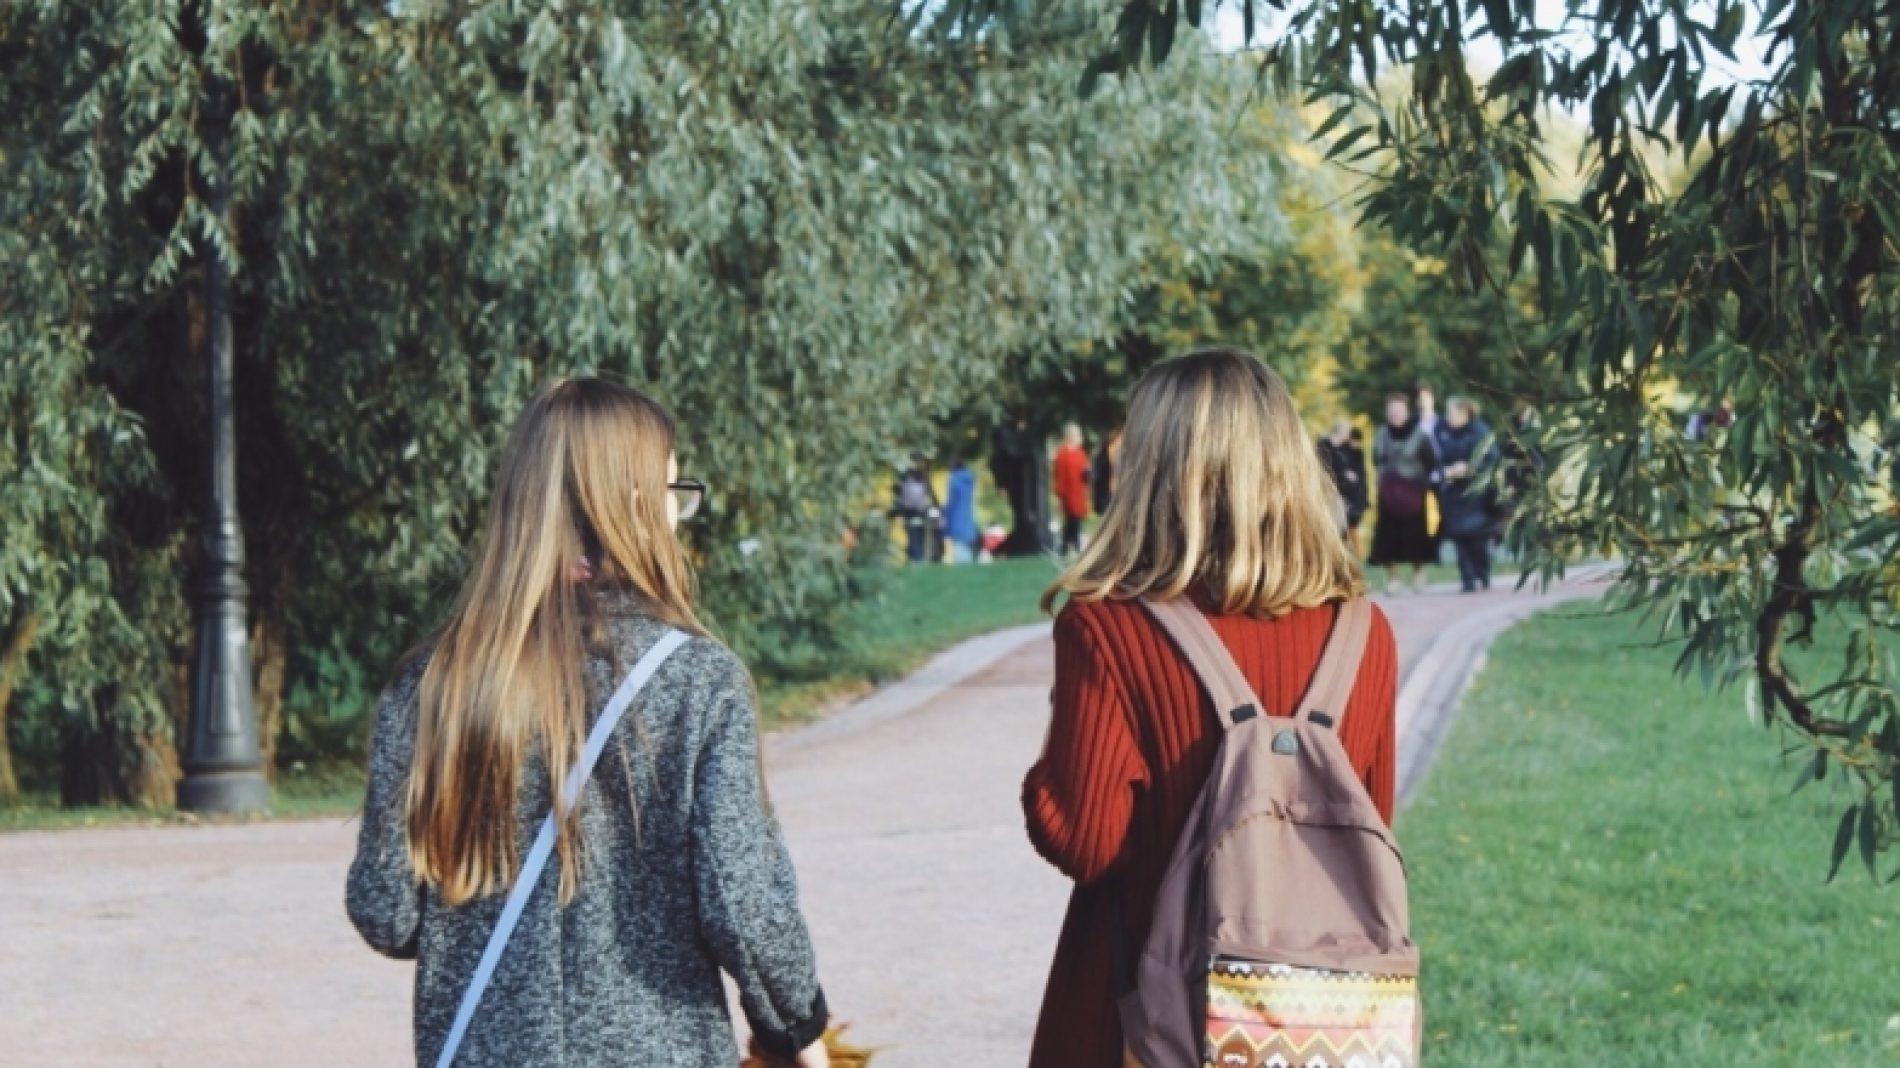 students-in-the-park_t20_VKlkm8